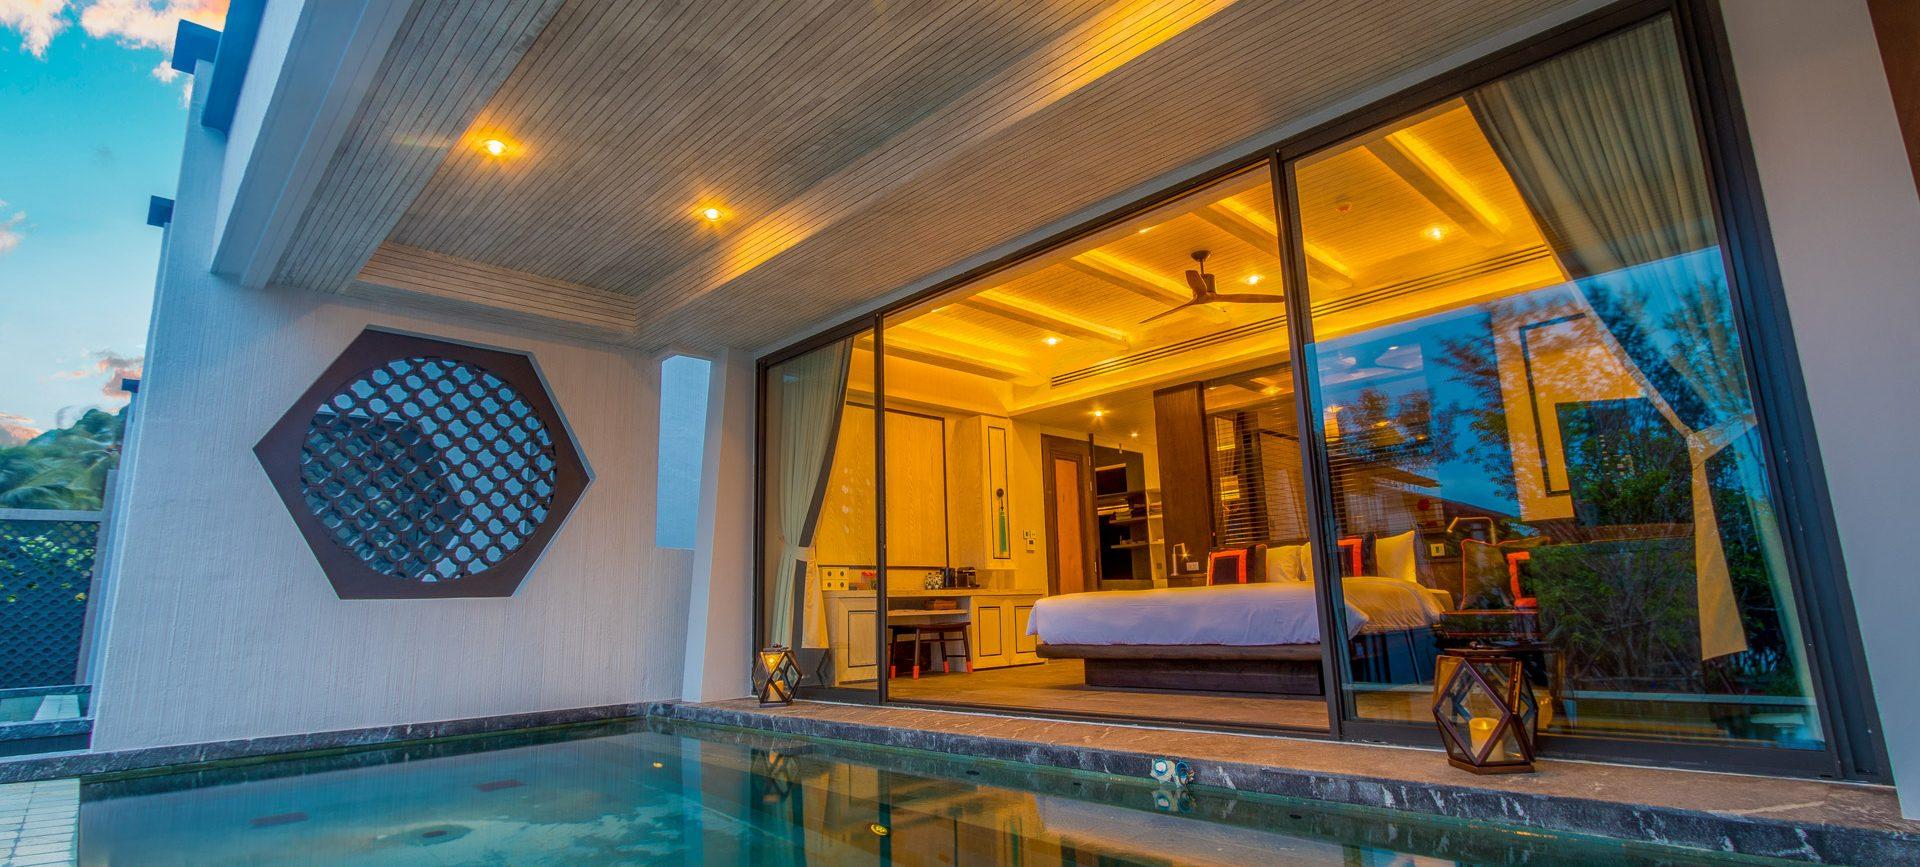 5 Star Hotel Phuket